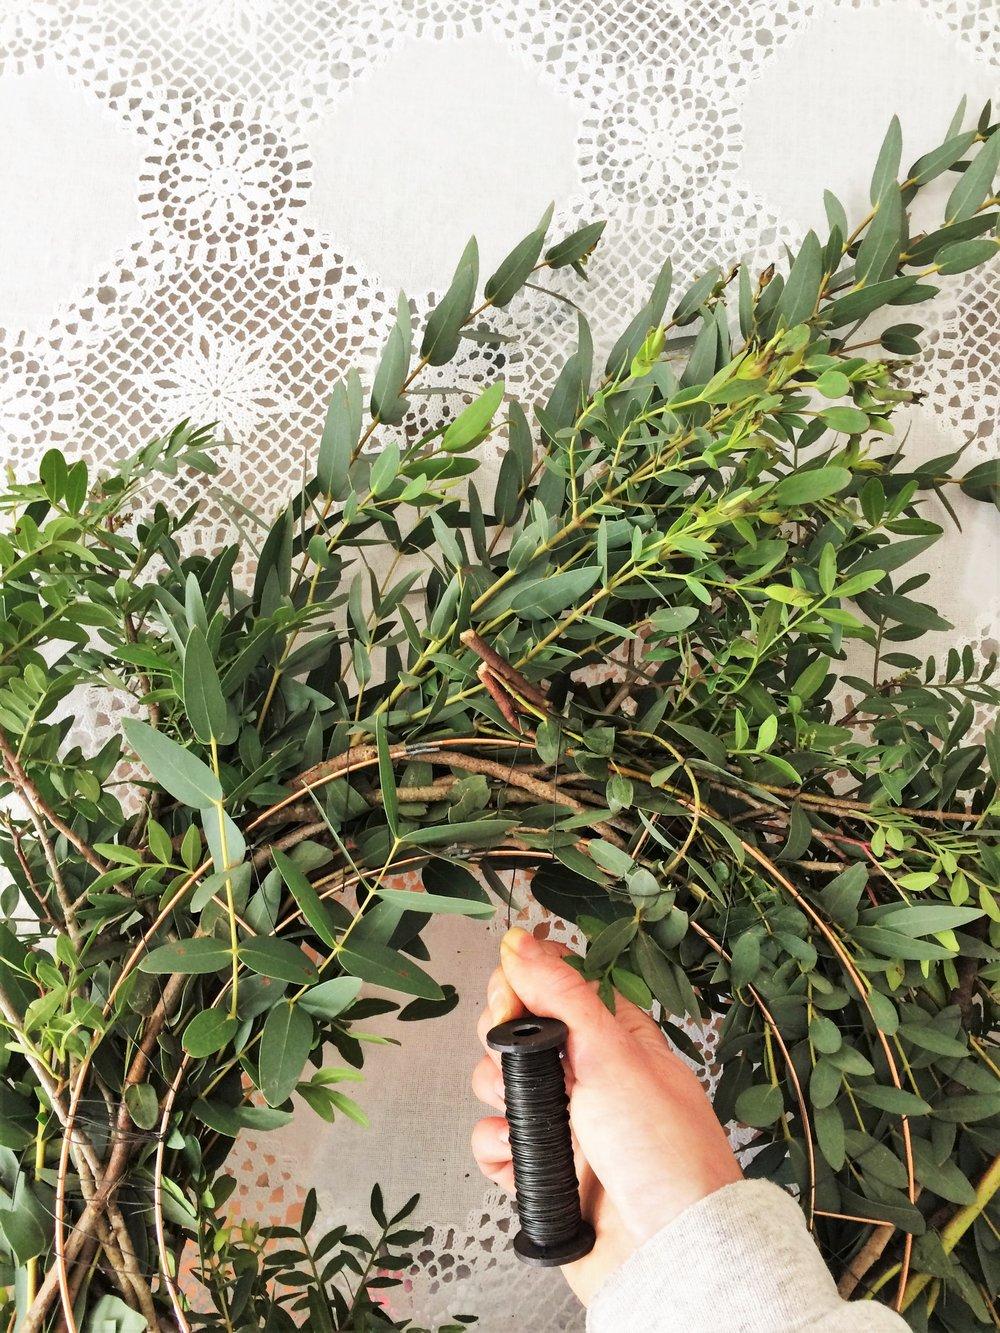 Webb-and-Farrer-Brighton-Florist-Sussex-Wedding-Flowers-How-to-make-a-foliage-wreath-DIY-tutorial (9).JPG